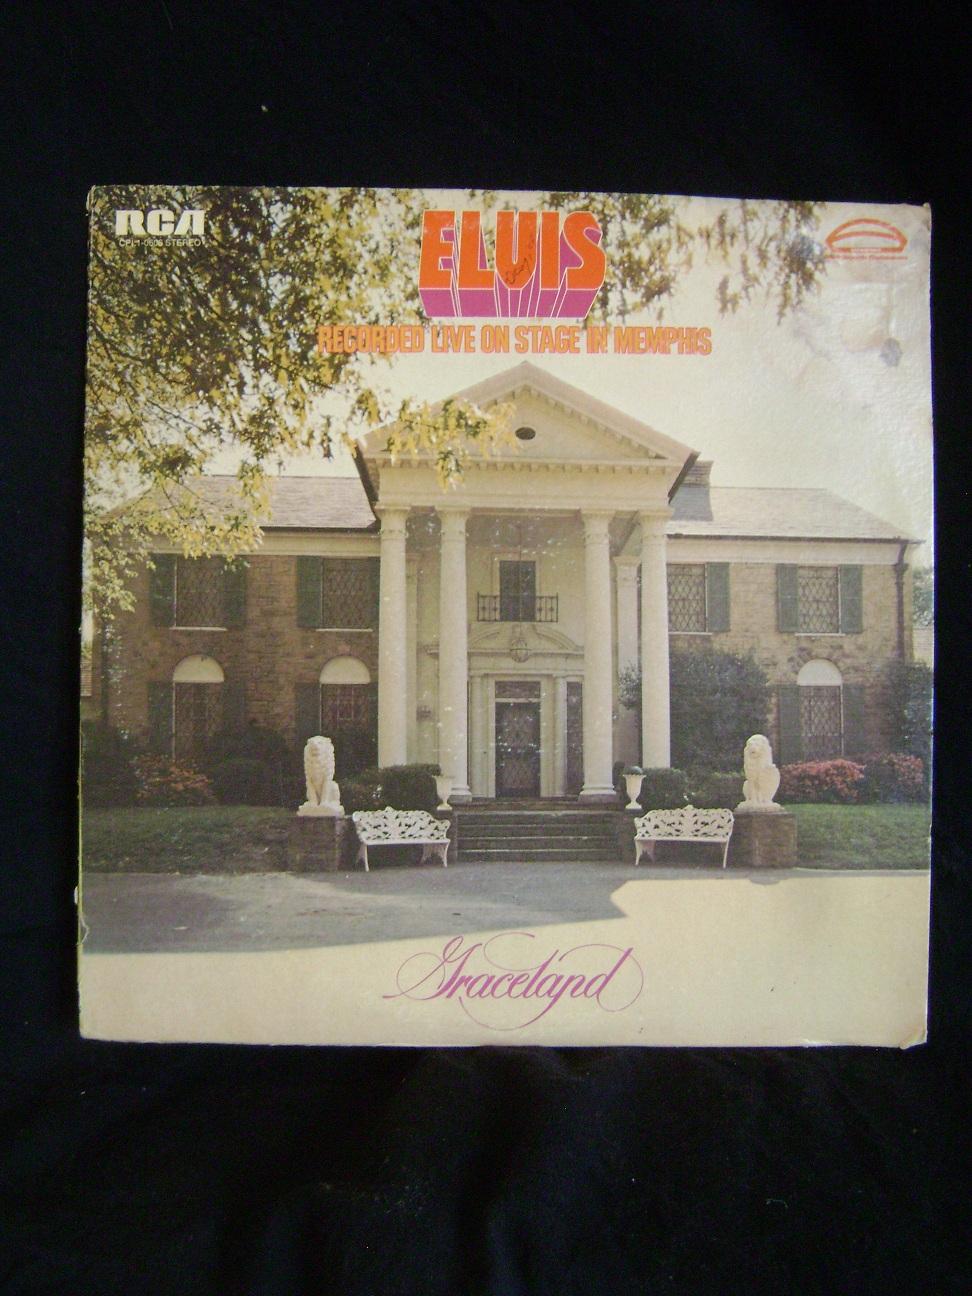 Ploca_LP_Elvis_Presley_Recorded_Live_On_Stage_In_Memphis_1.JPG